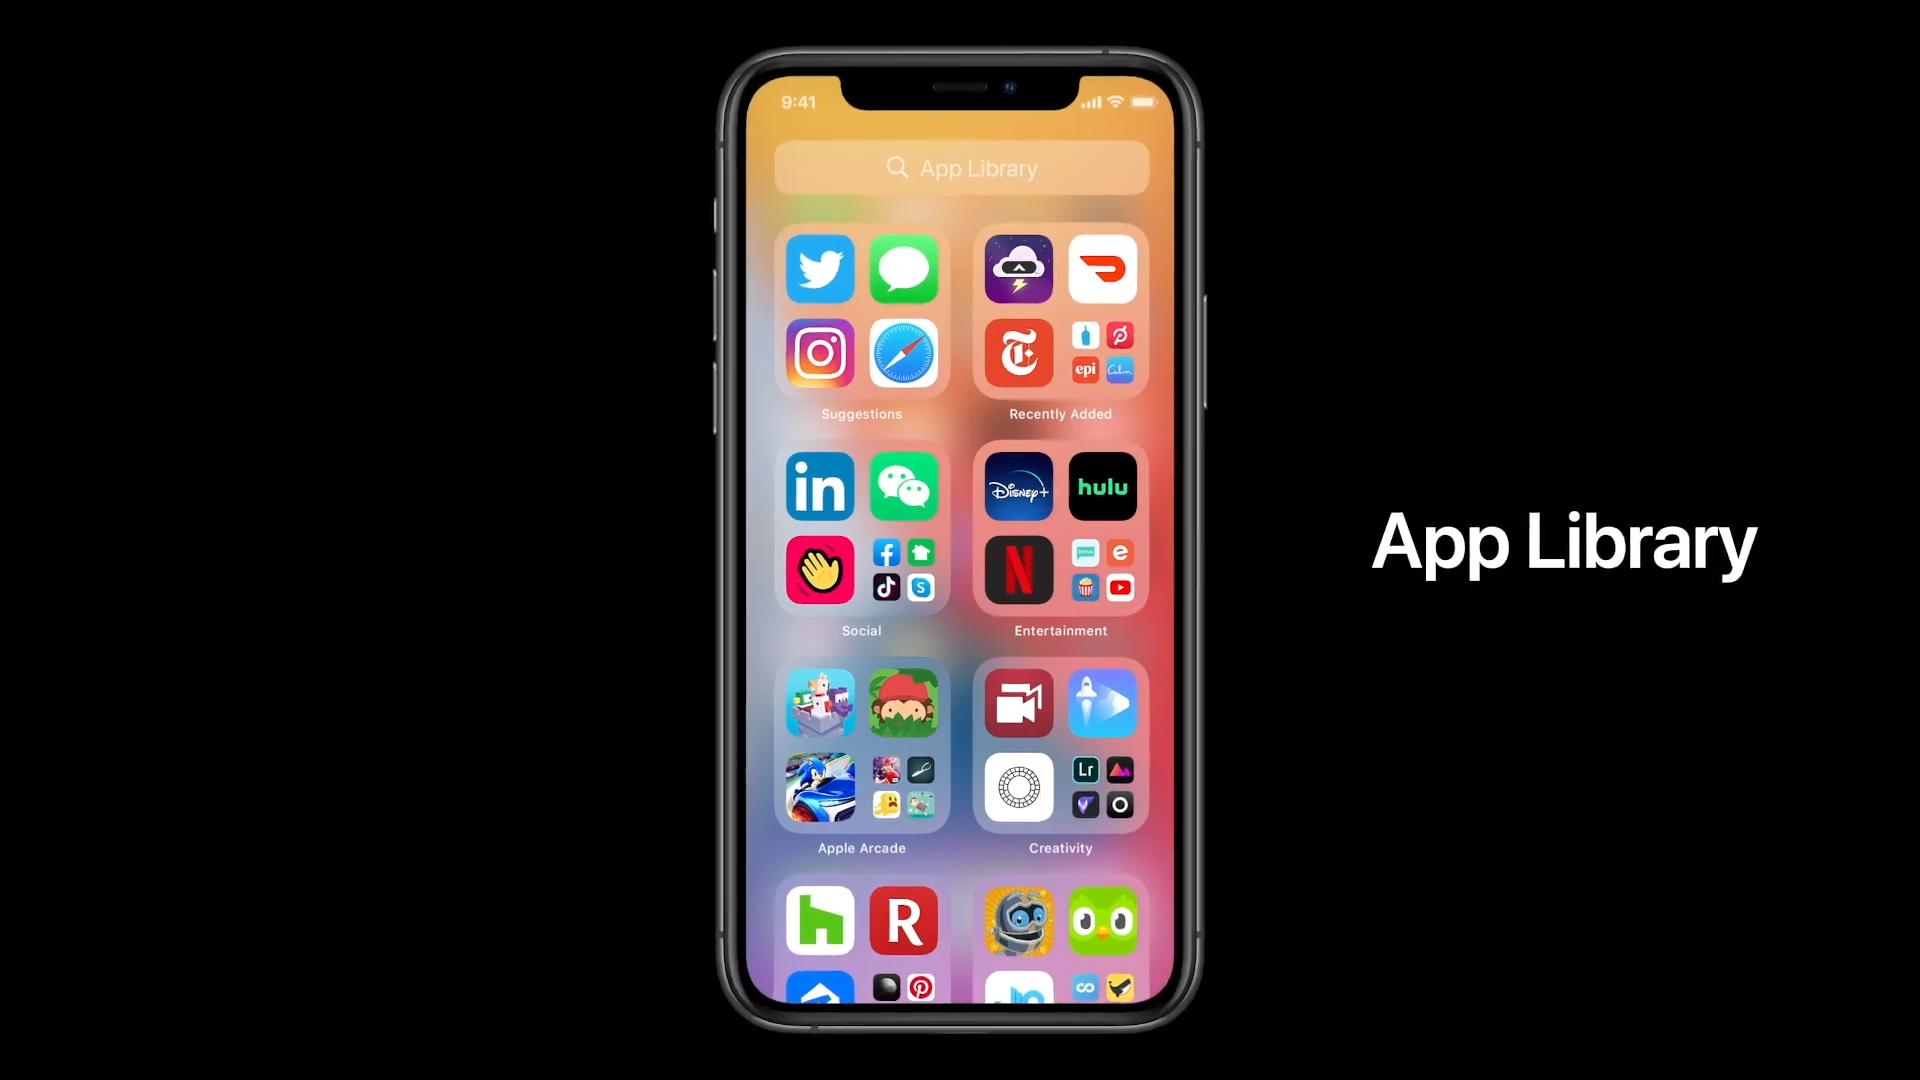 Agencia Tributaria în App Store